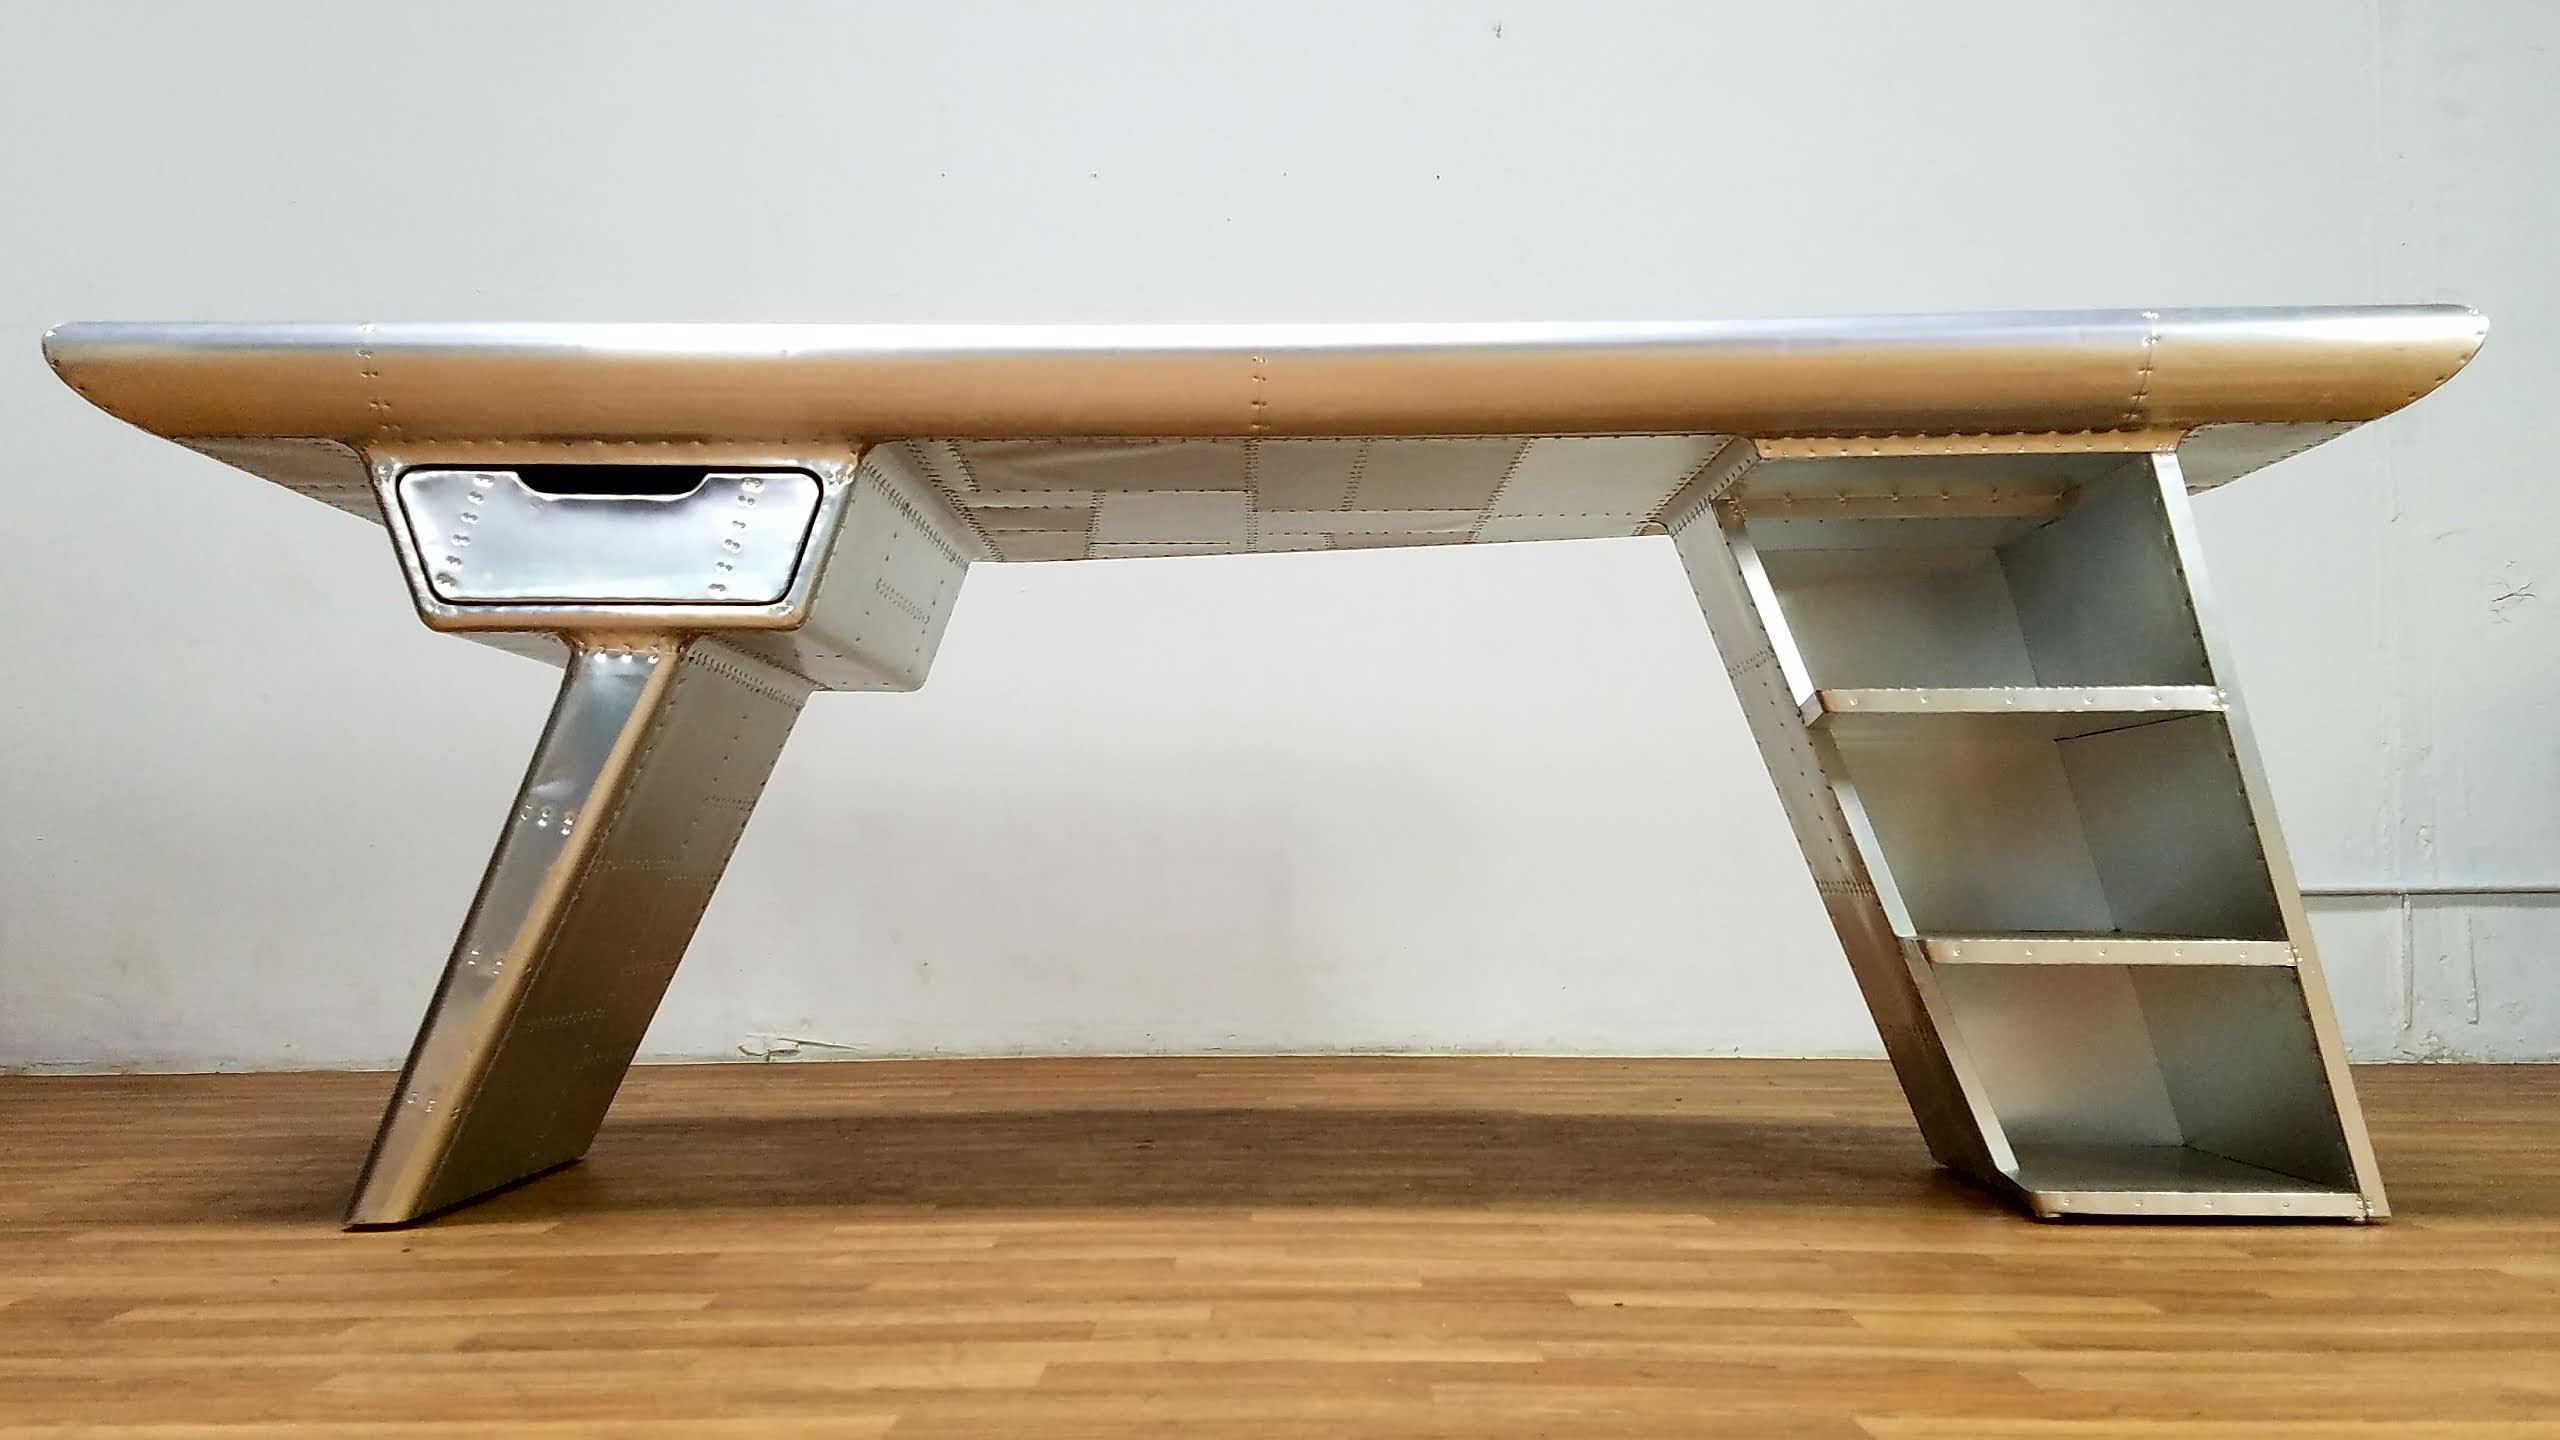 restoration hardware aviator desk. Restoration Hardware Aviator Desk For Sale - Image 12 Of 13 A